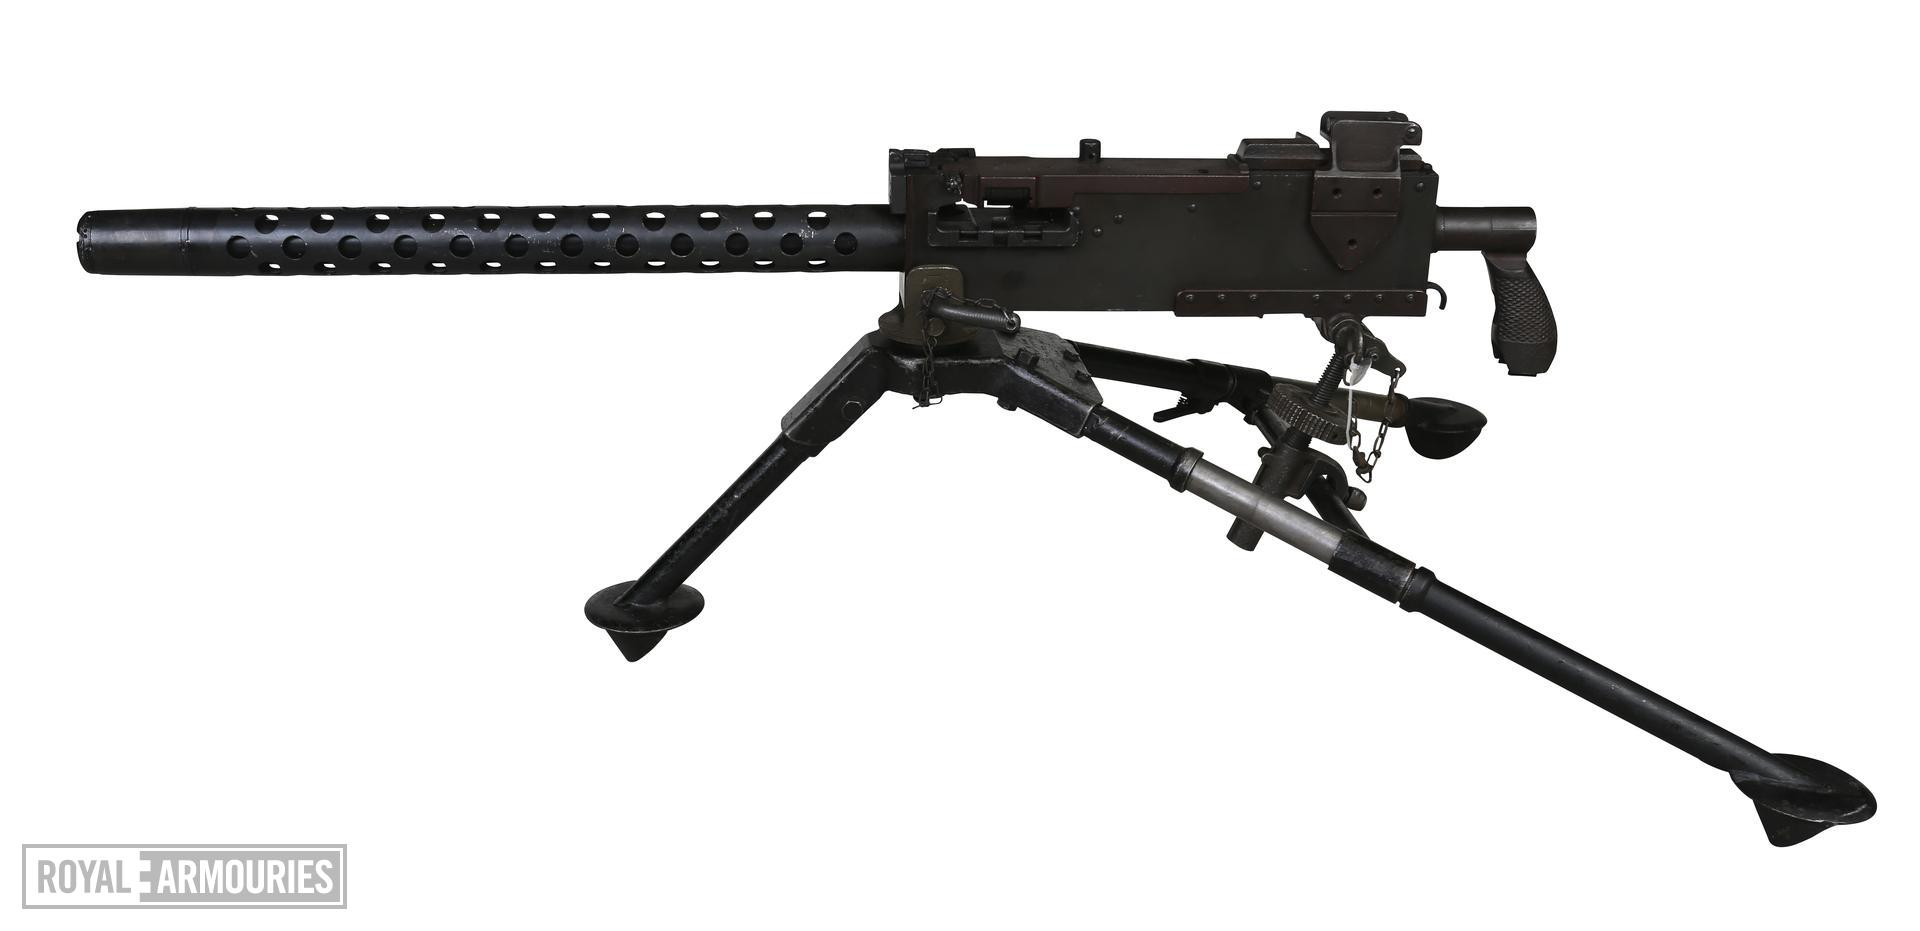 Centrefire automatic belt-fed medium machine gun - Browning Model 1919A4